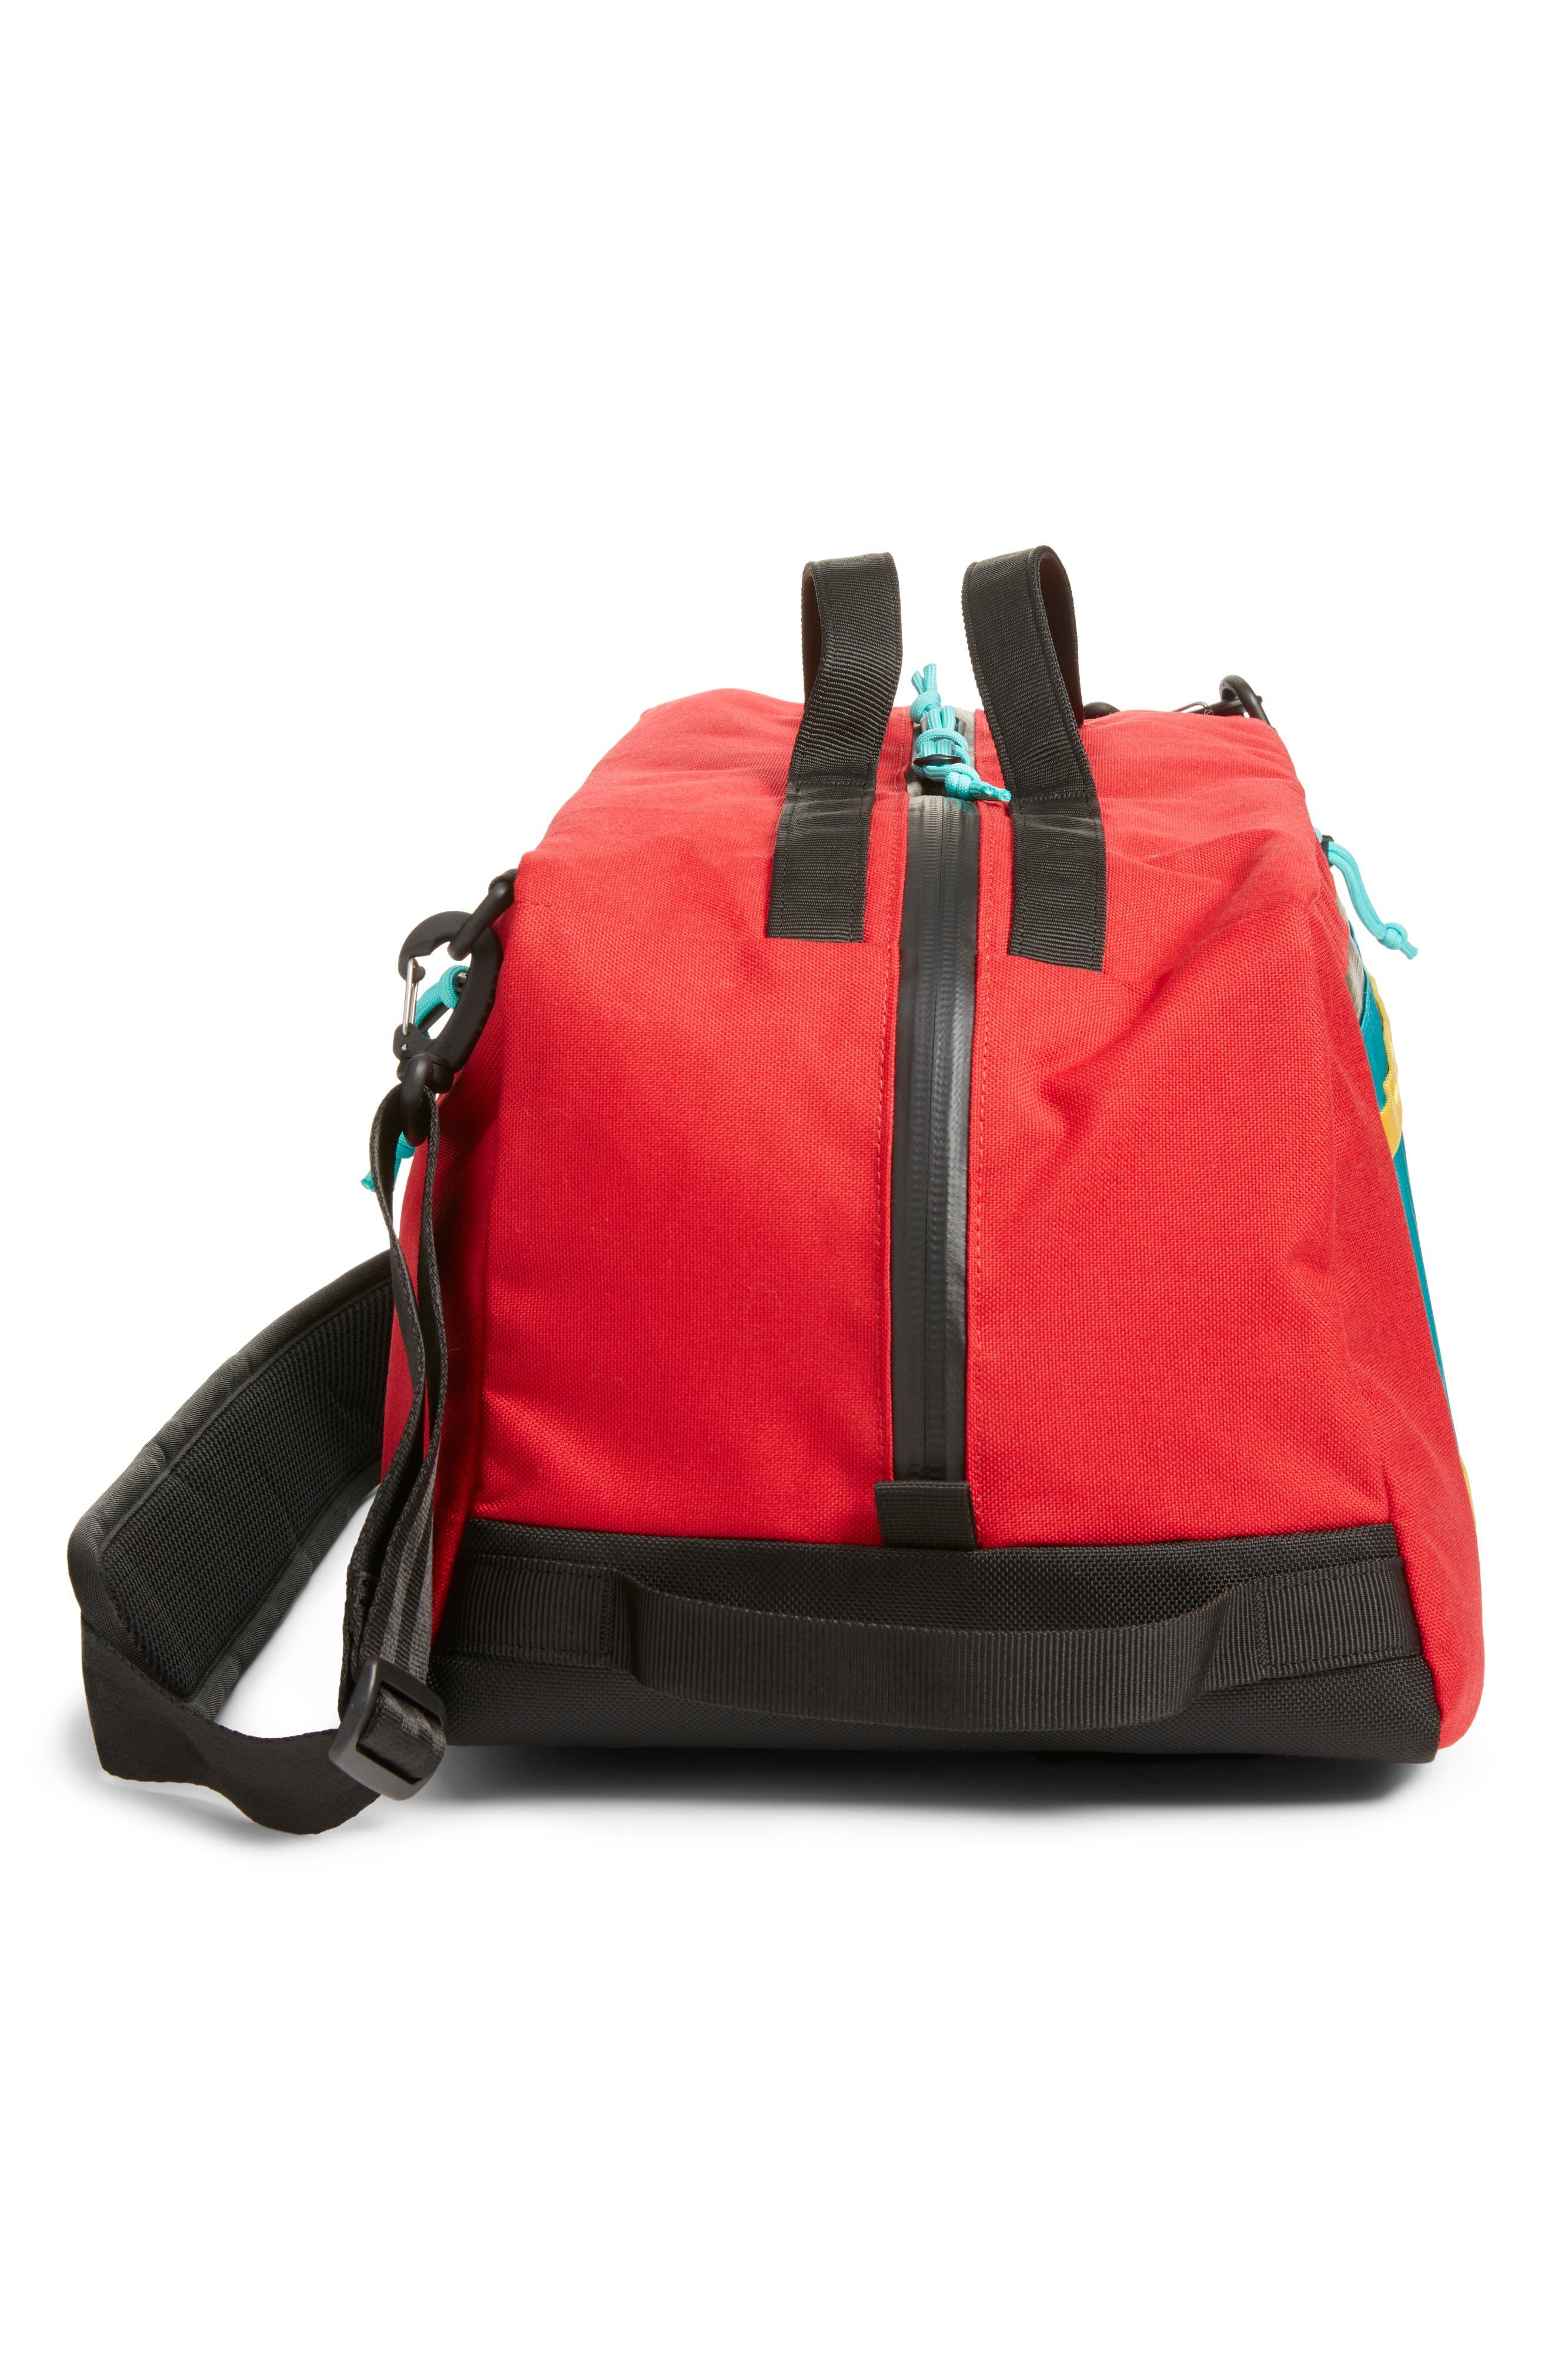 Mountain 40L Convertible Duffel Bag,                             Alternate thumbnail 5, color,                             600